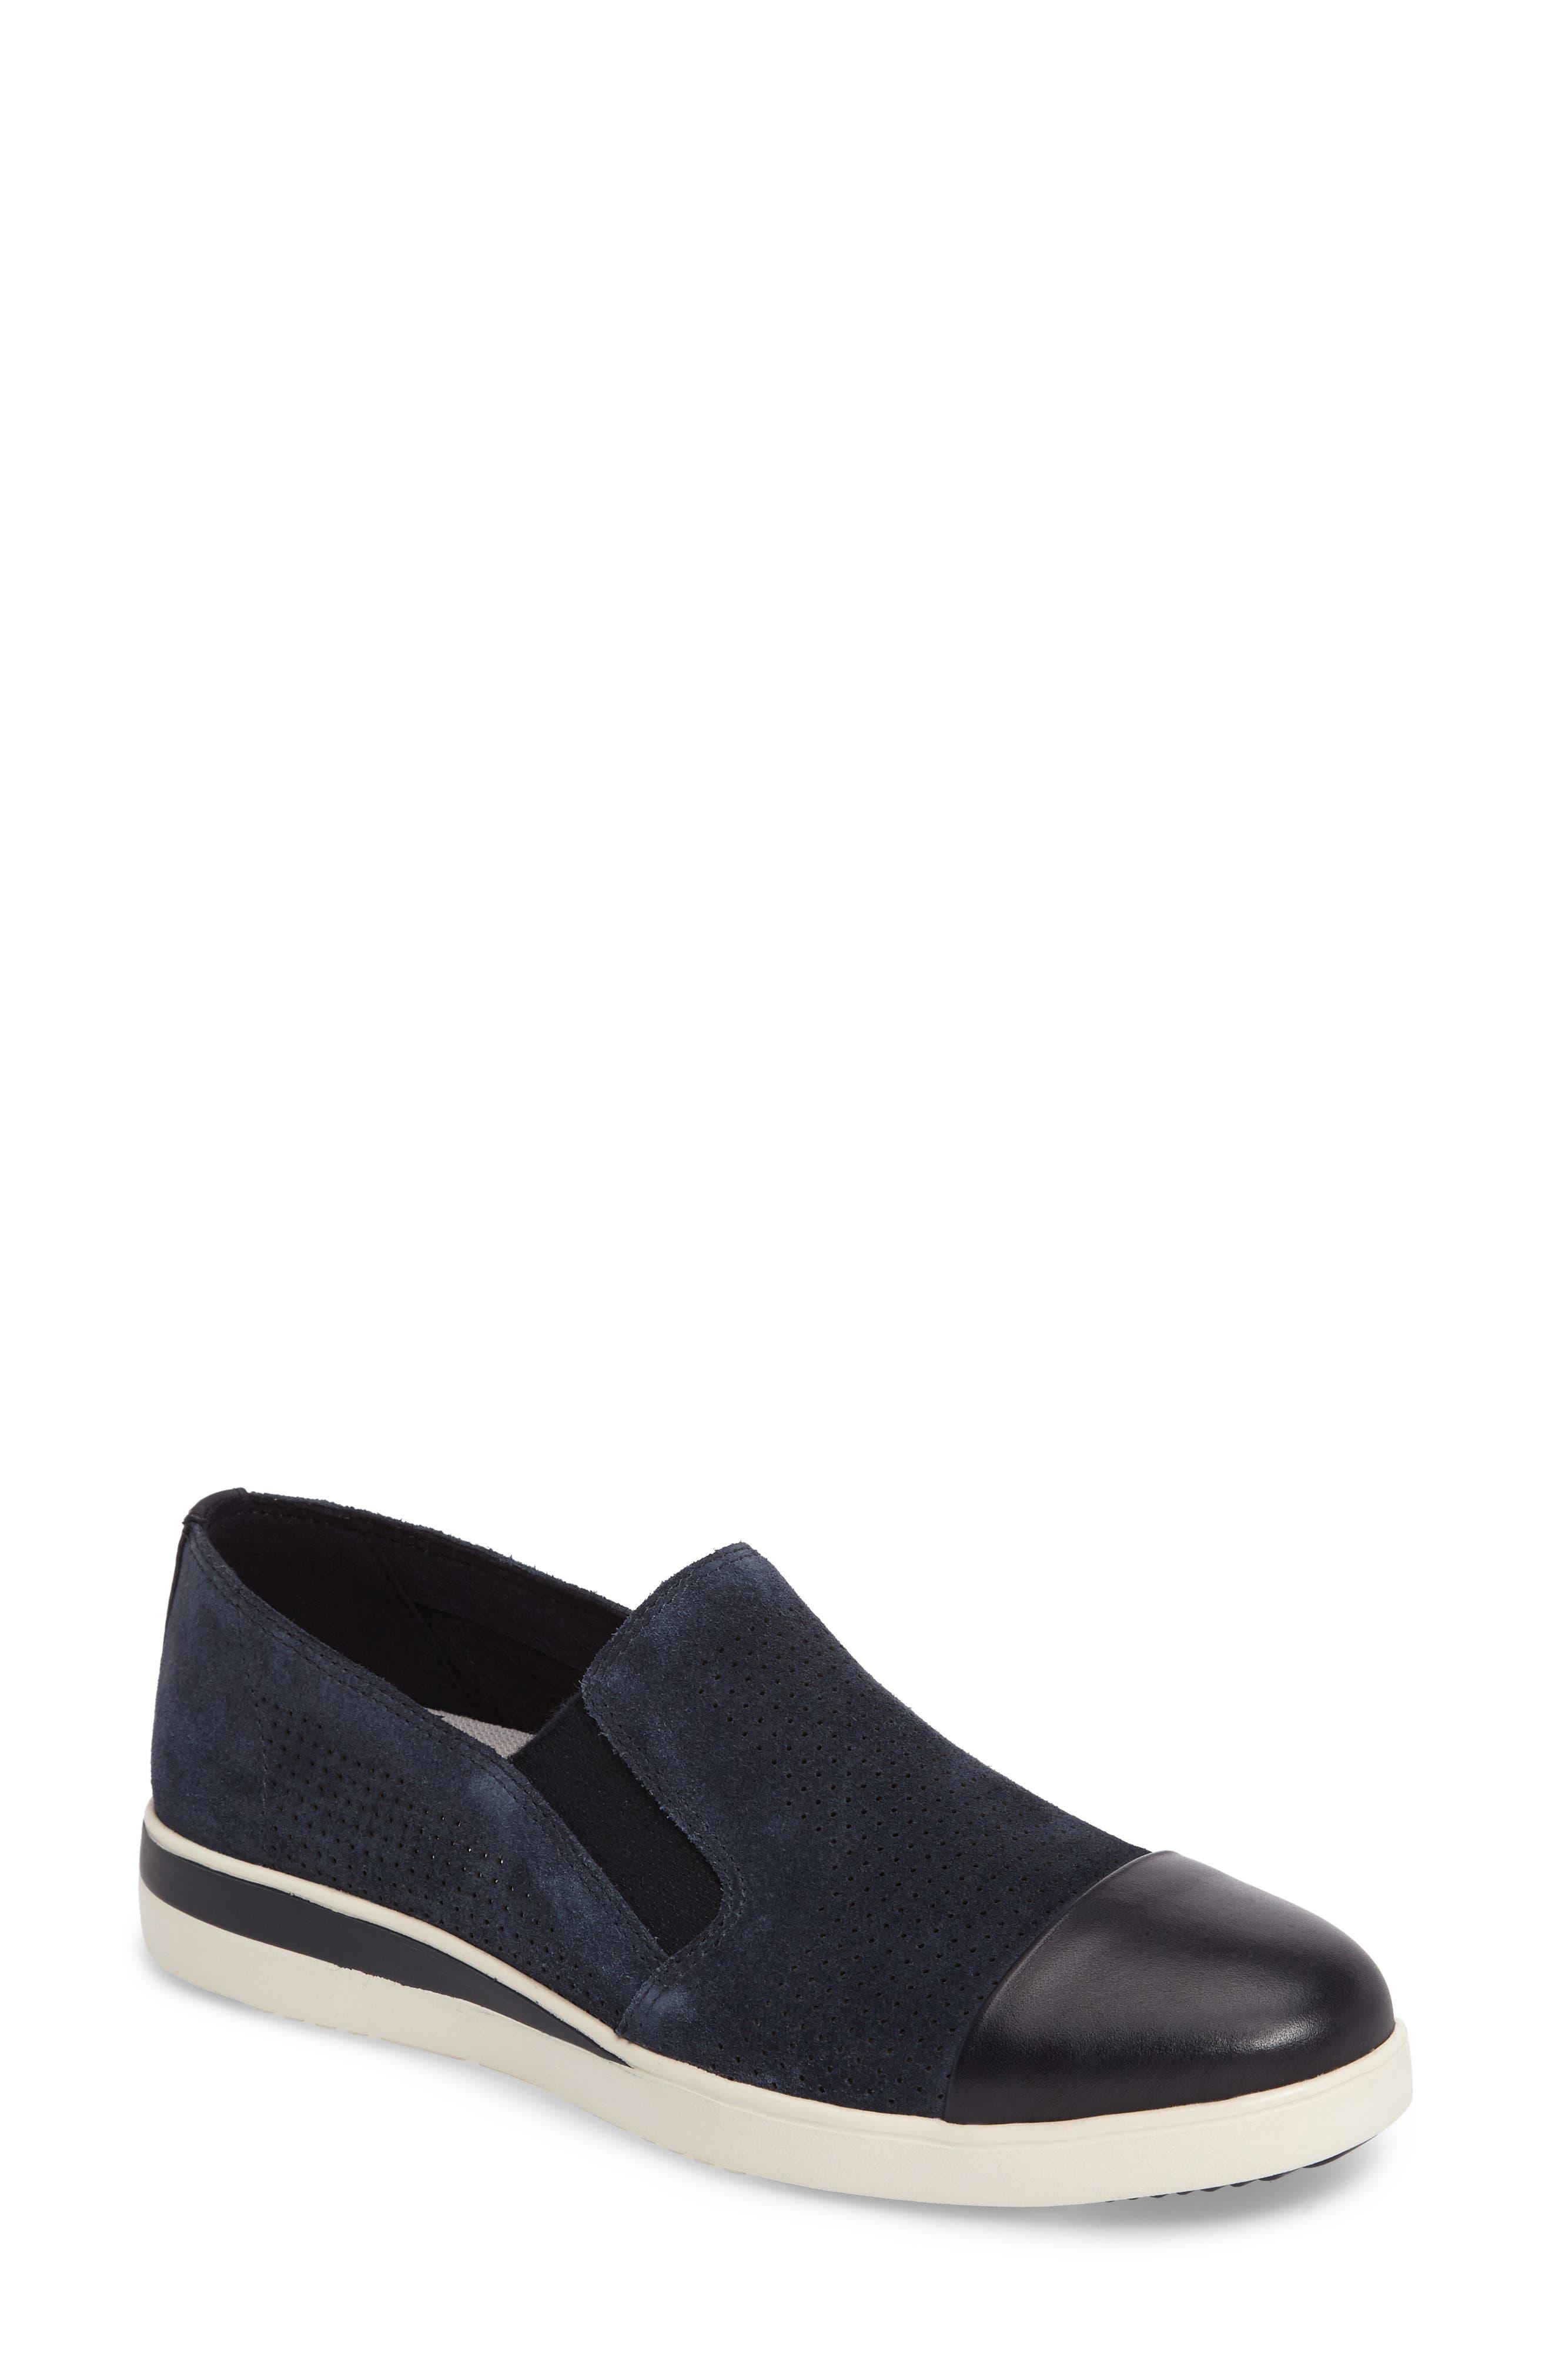 Aviana Cap Toe Slip-On Sneaker,                         Main,                         color, Lagoon Suede